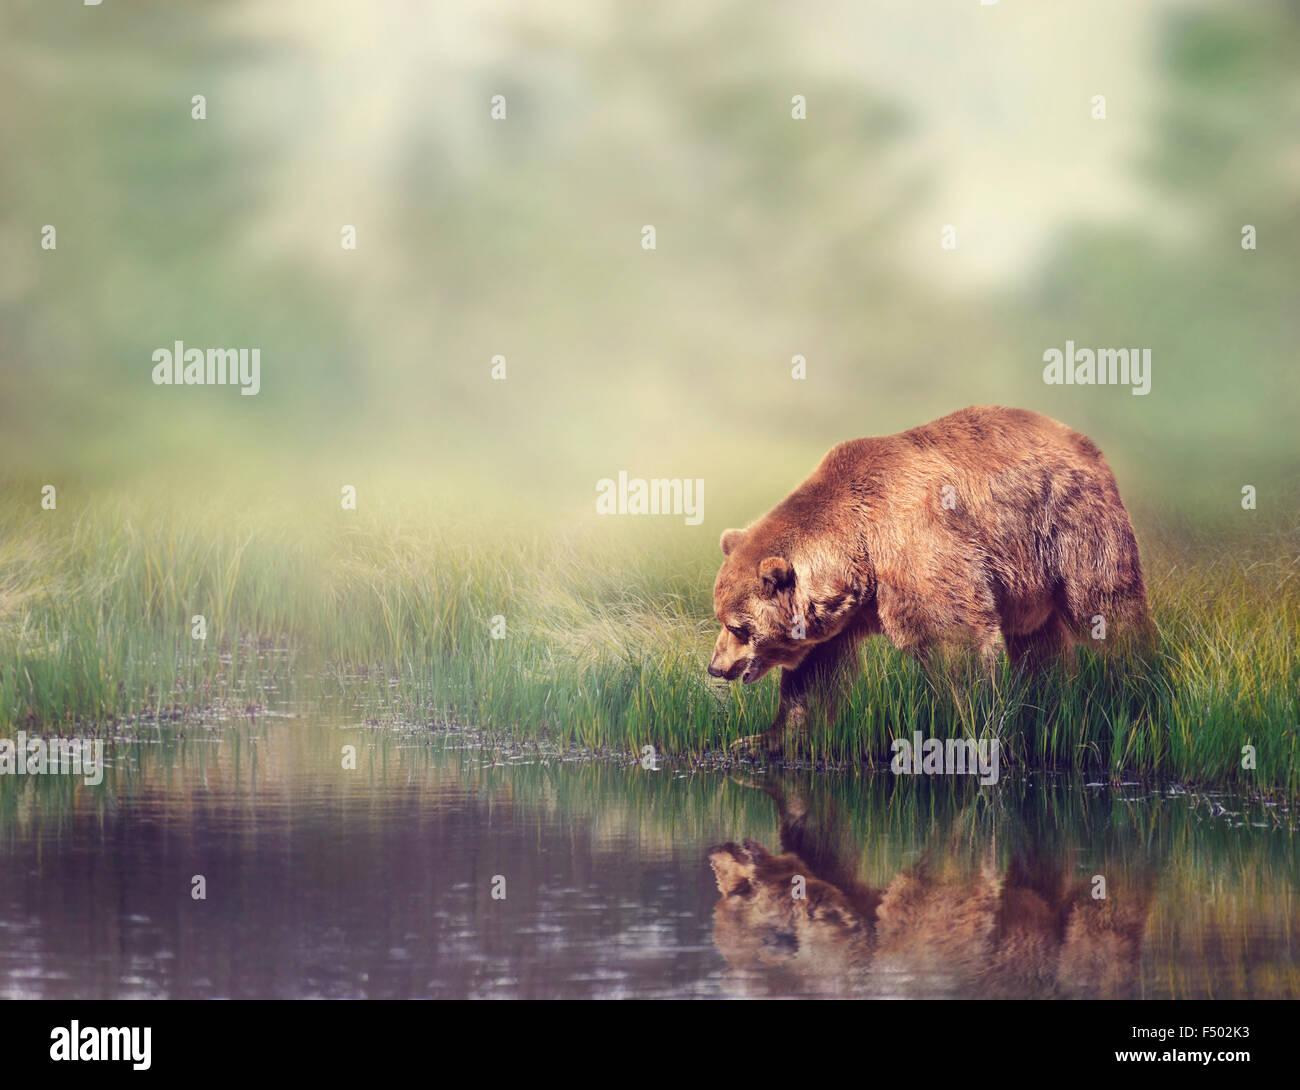 Oso Pardo junto al estanque con reflexión Imagen De Stock